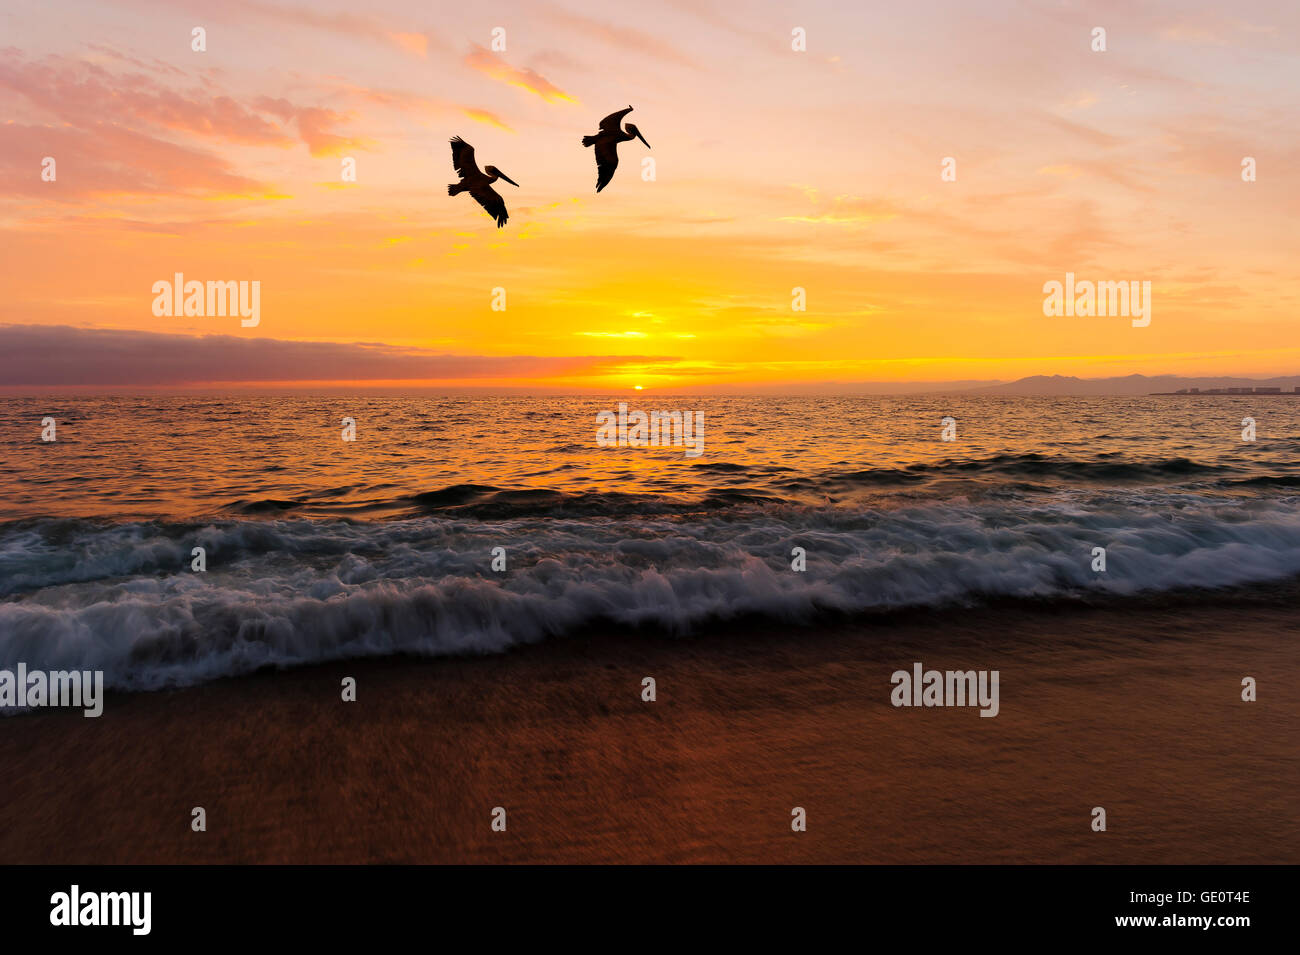 Silhouetten der Vögel ist zwei große Seevögel fliegen gegen ein lebendigen und bunten Meer Sonnenuntergang Stockbild